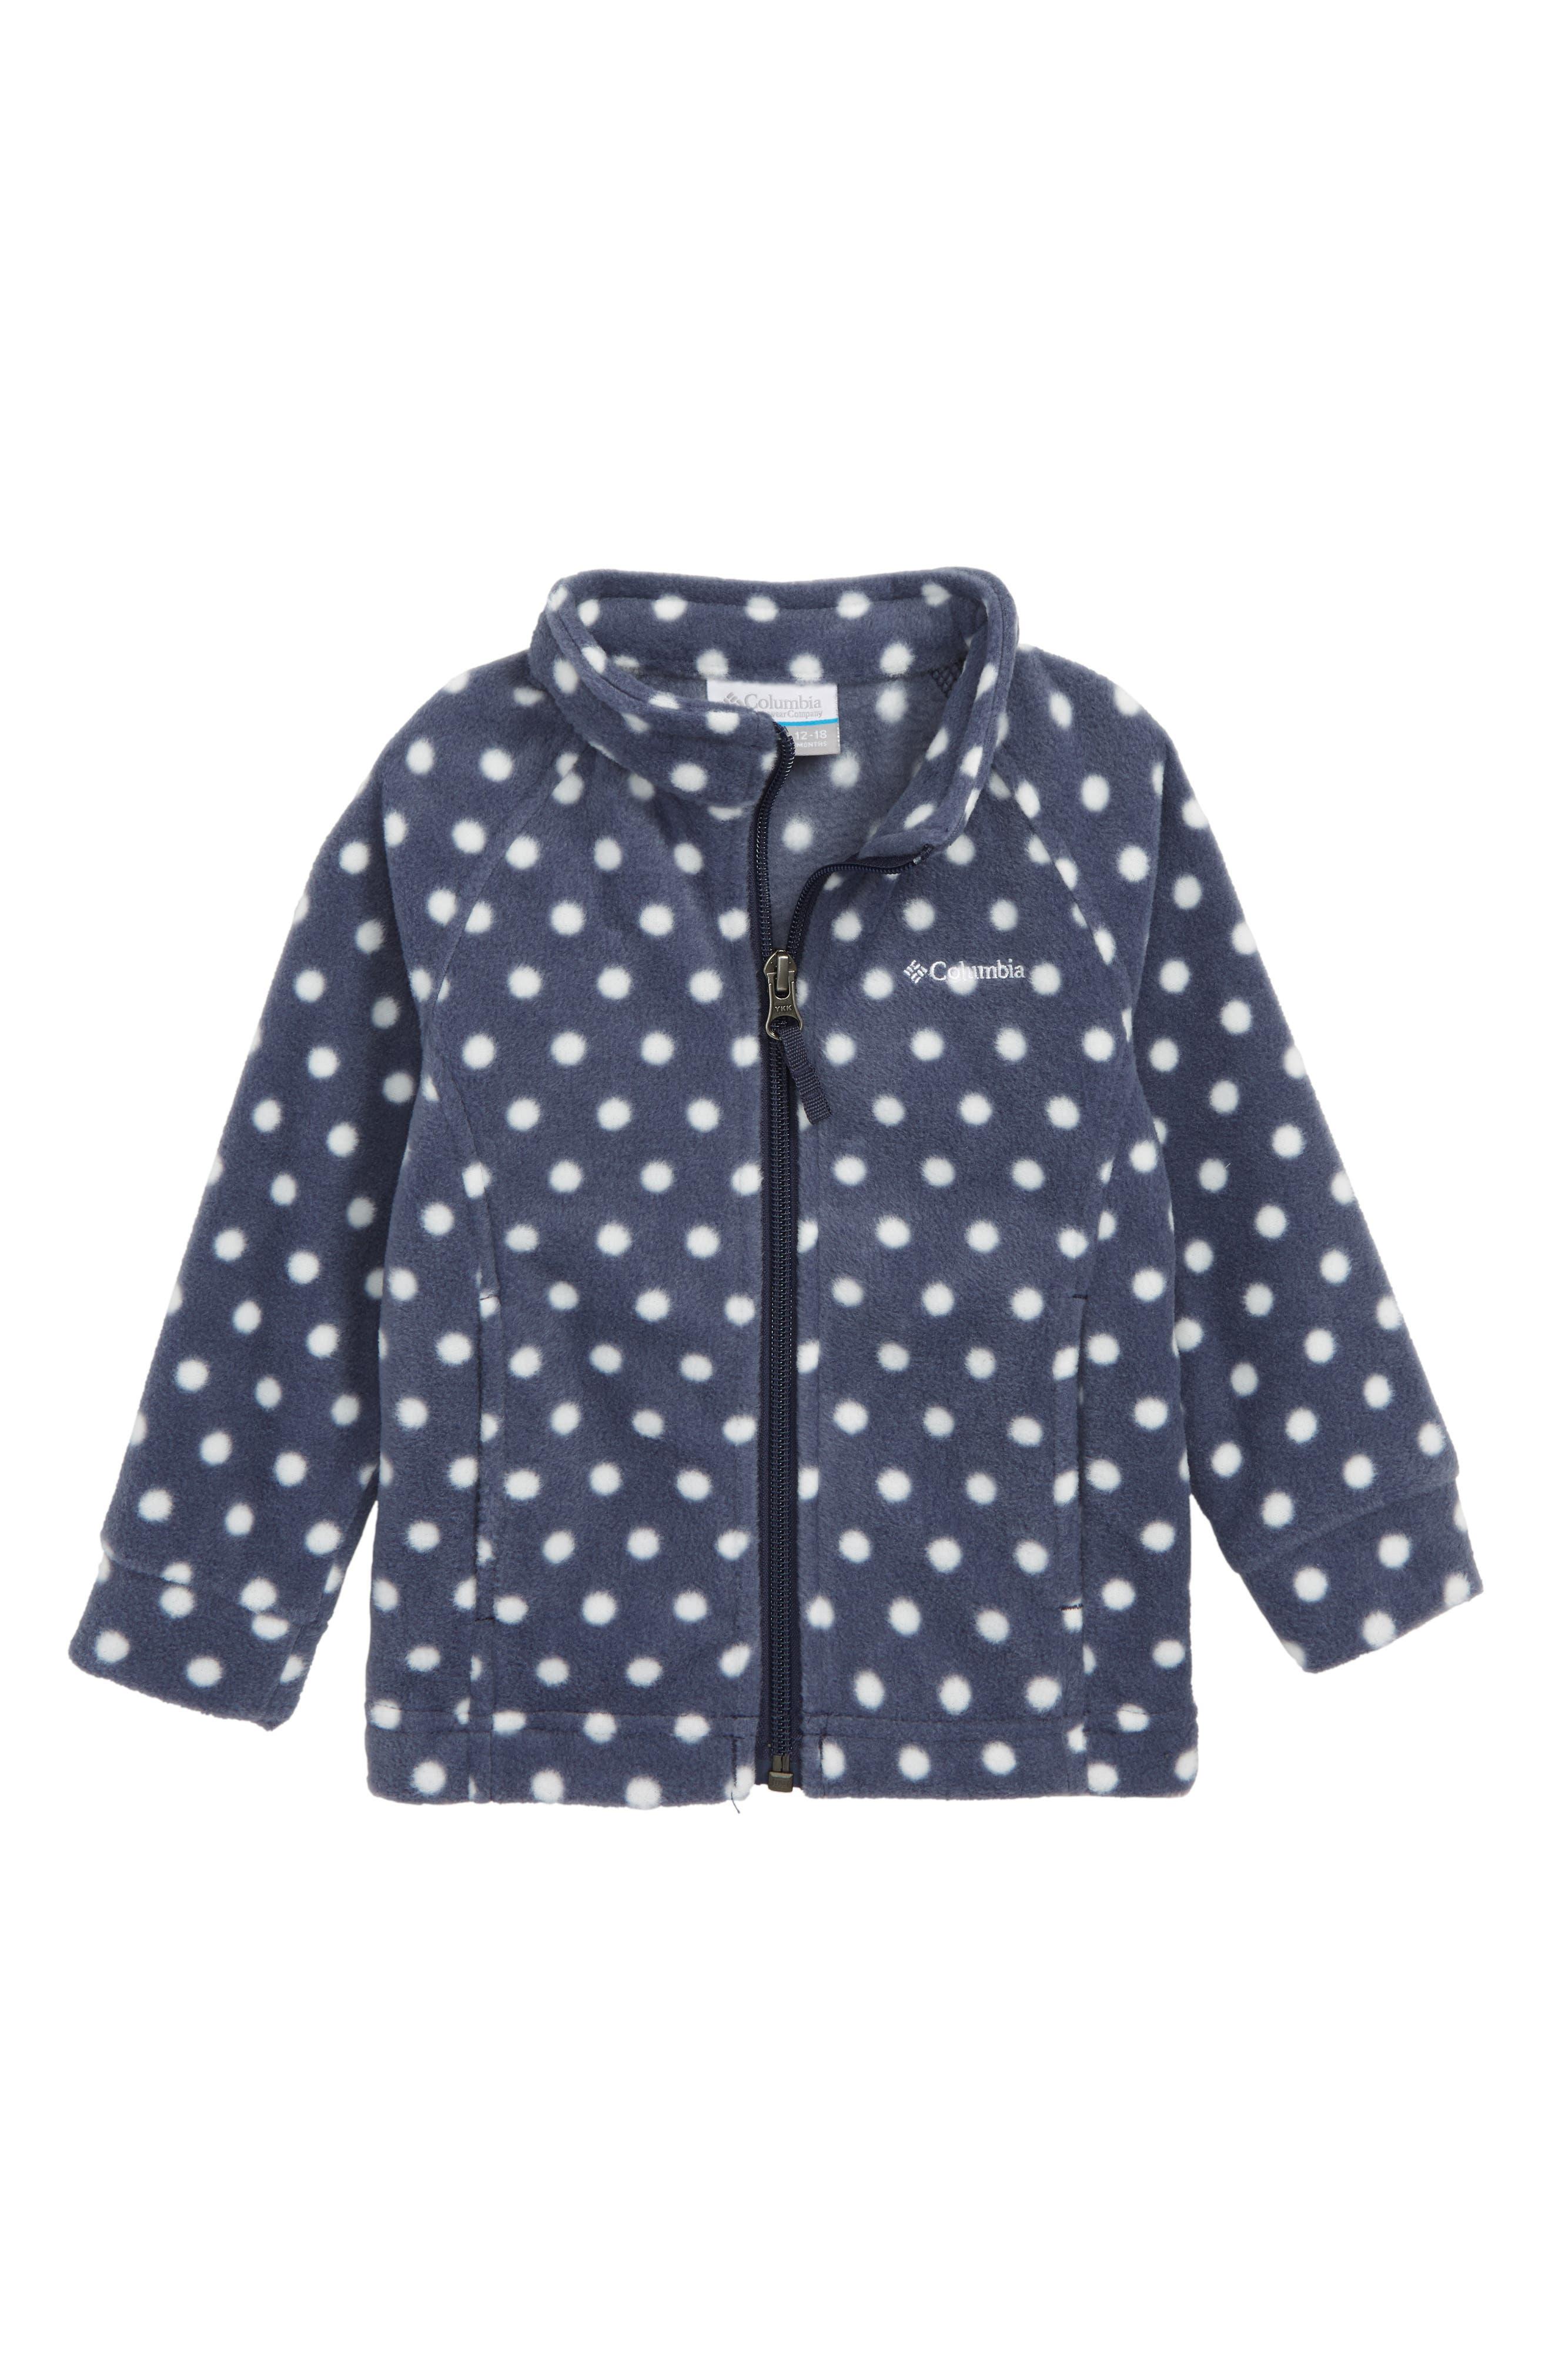 442d4a397 Kids  Coats   Jackets